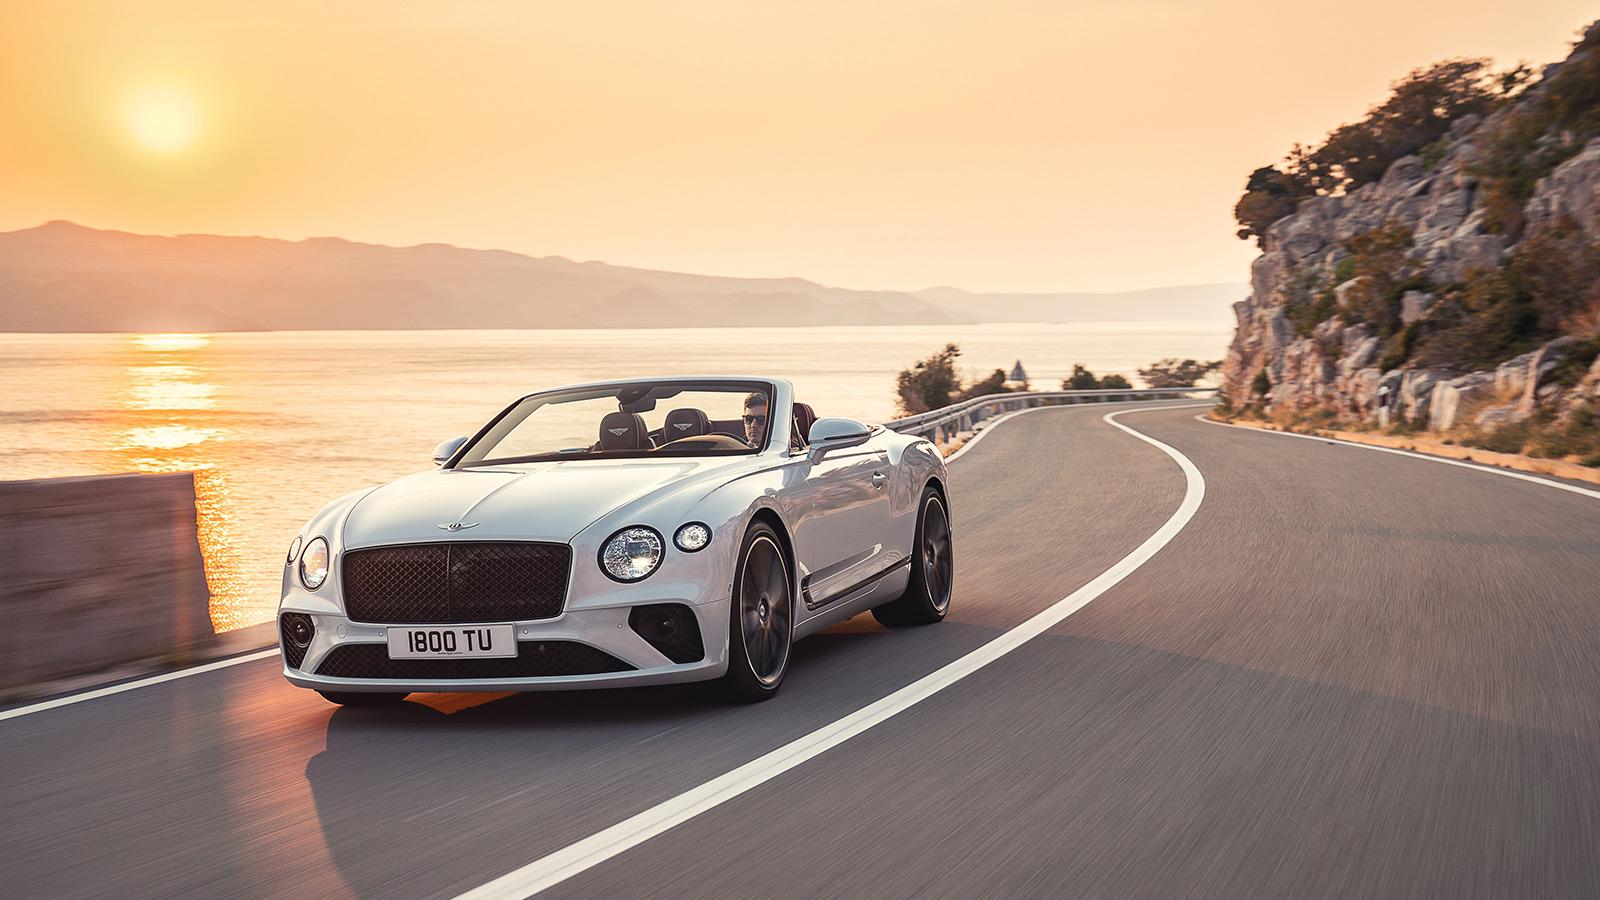 2020 Bentley Continental Gt Convertible Imboldn